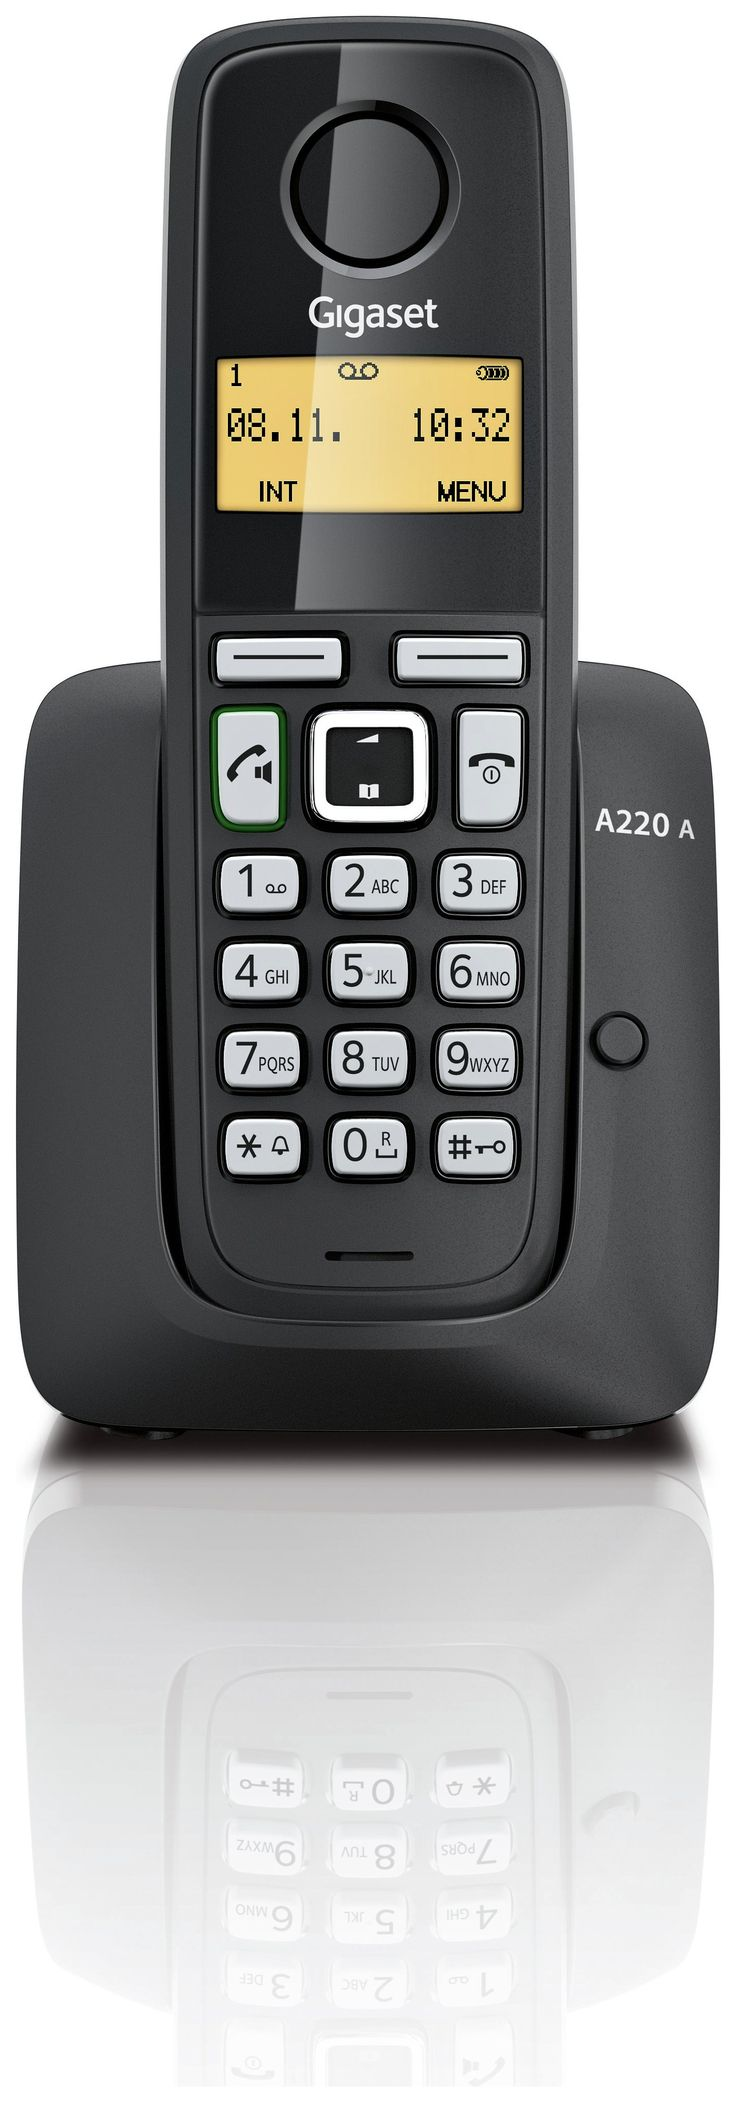 Gigaset - A220A X1 - Cordless Telephone TAM - Black